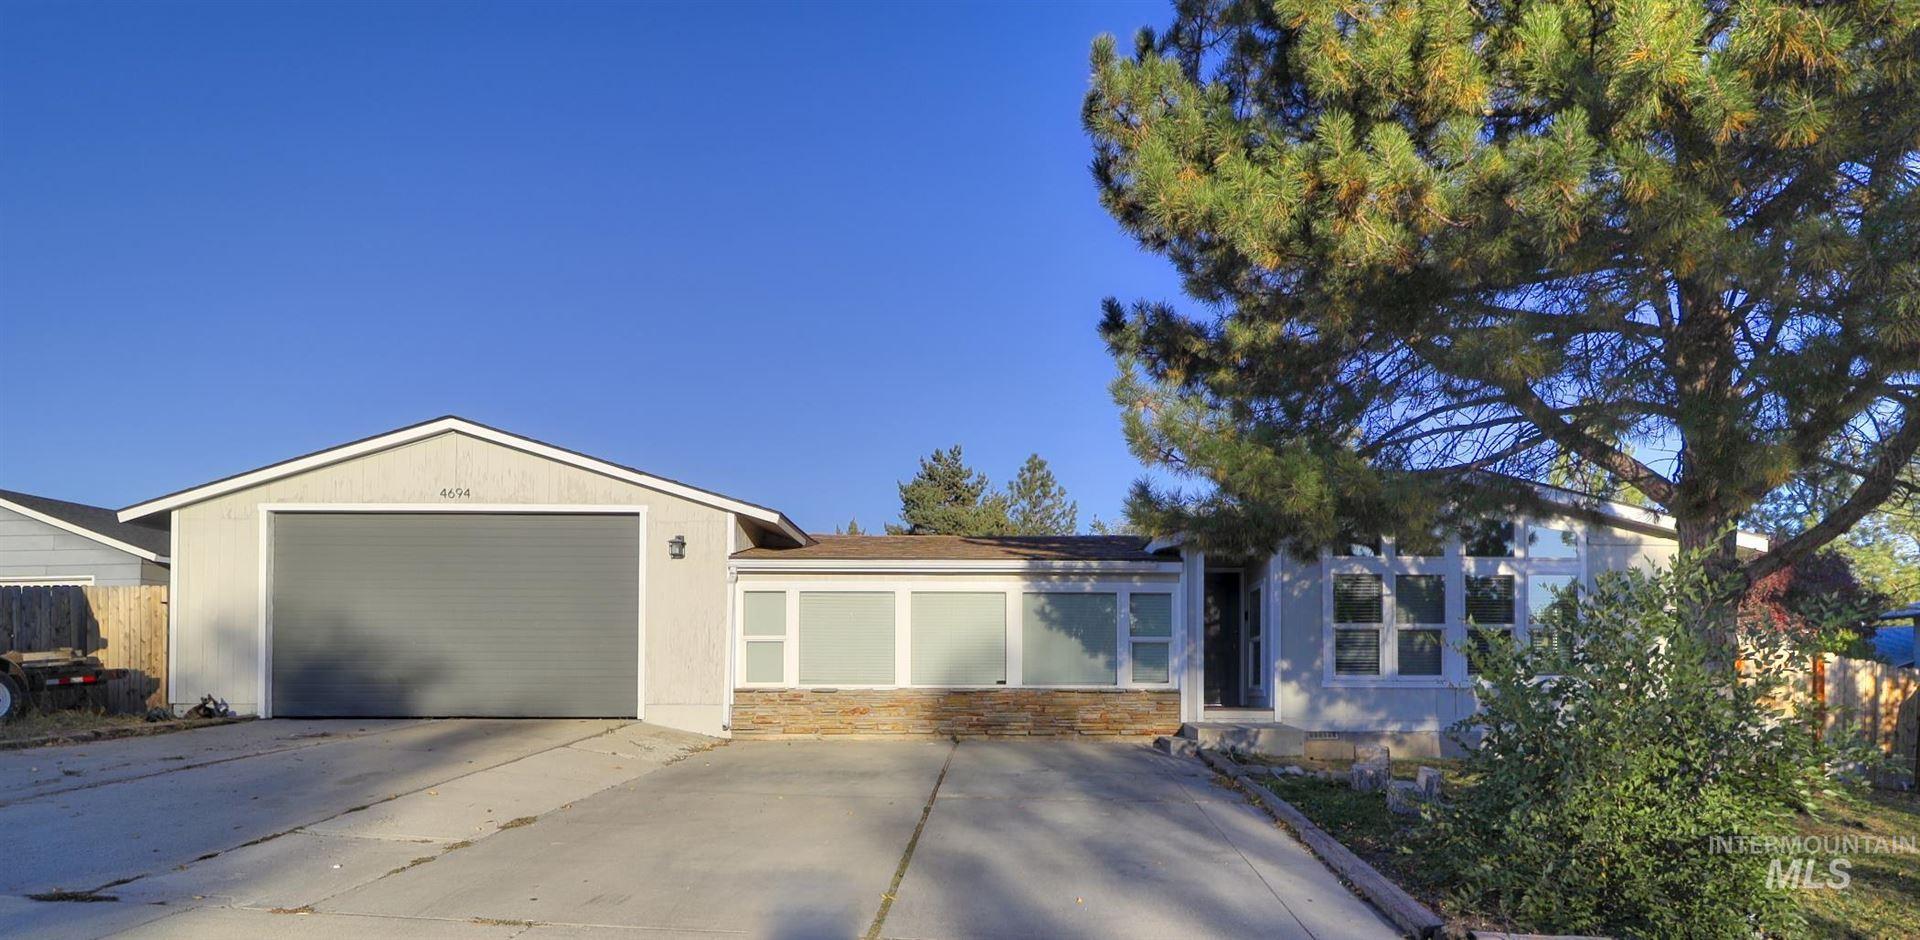 4694 S Packtrain Avenue, Boise, ID 83709 - MLS#: 98822976